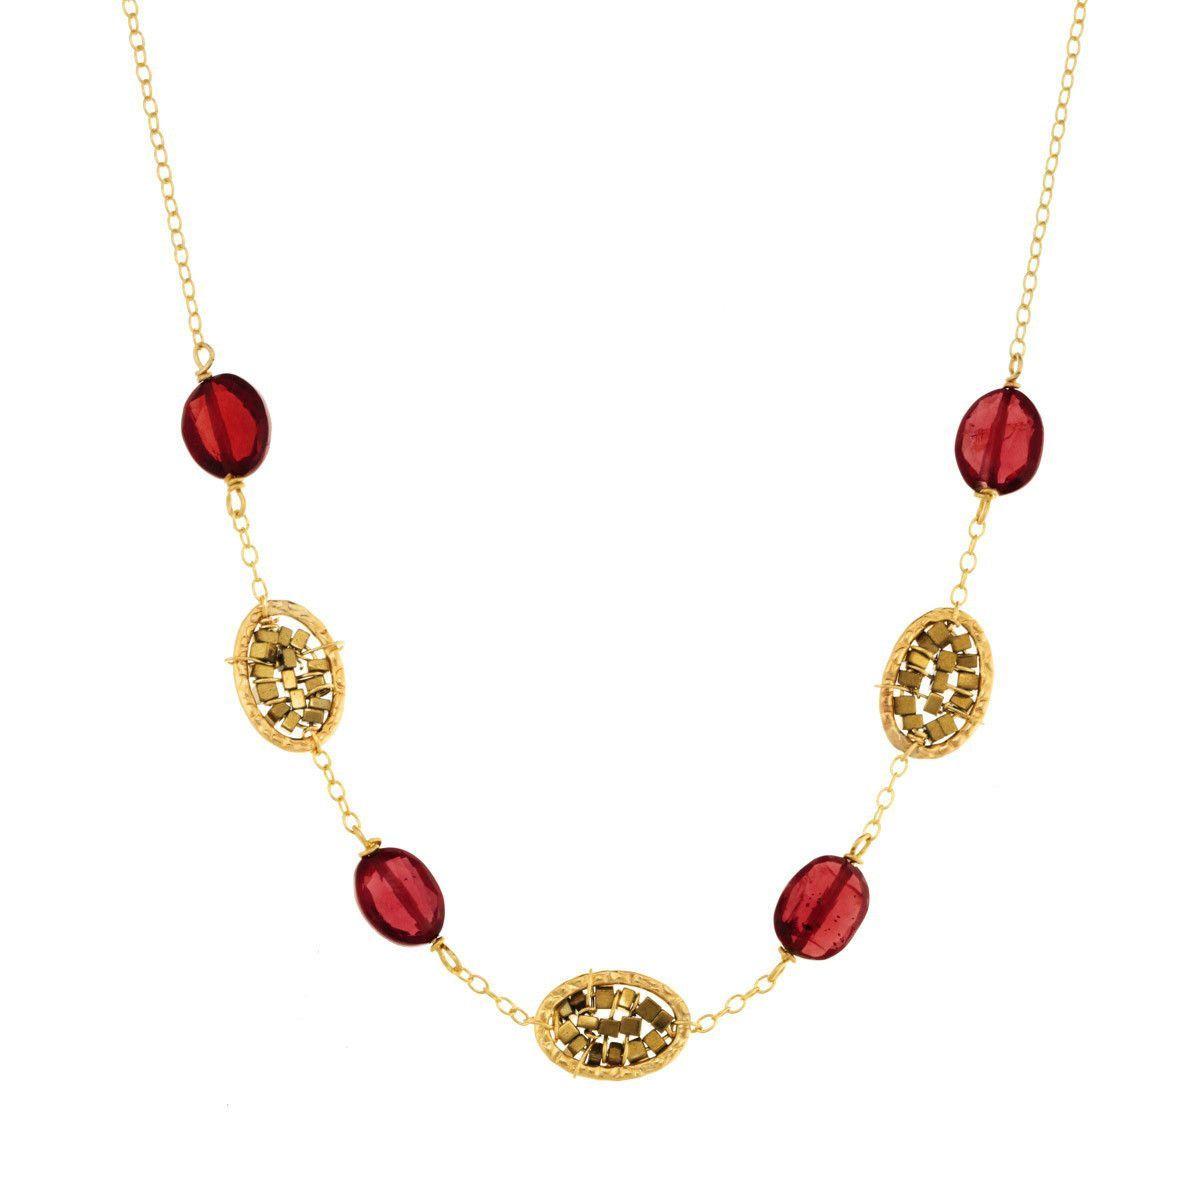 Garnet Necklace 3098 by Michelle Pressler Designer jewelry and Artisan